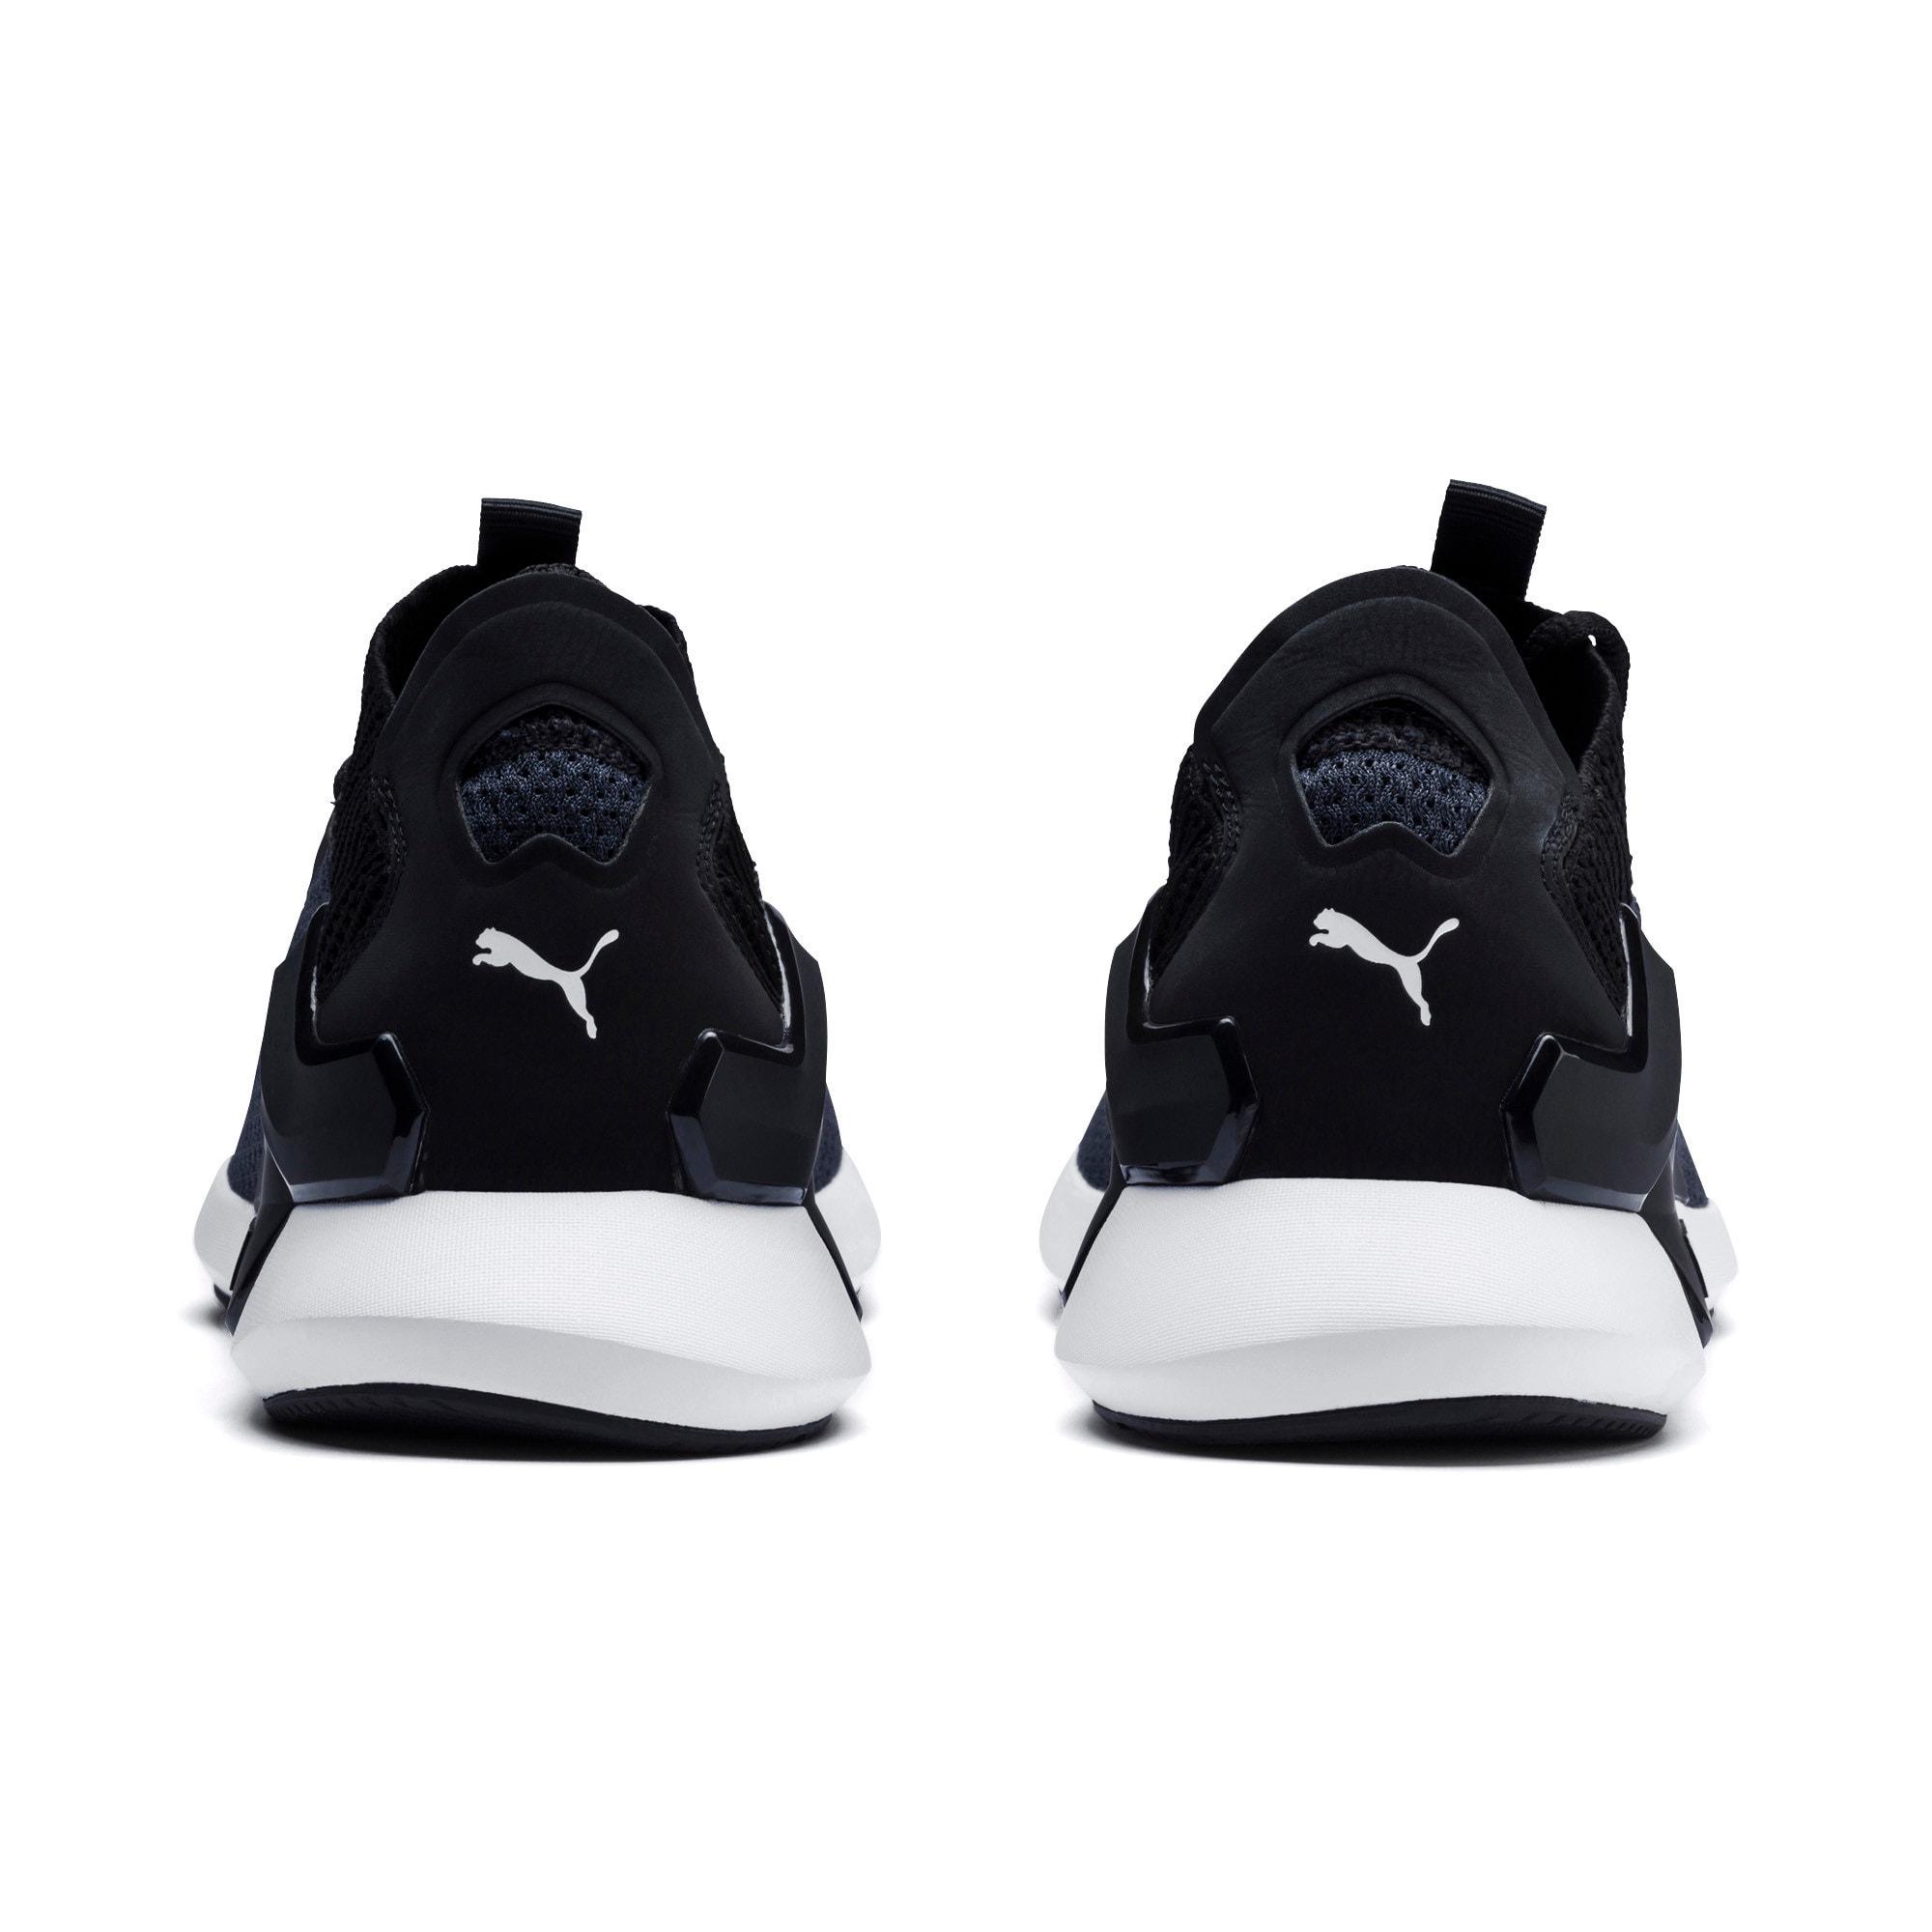 Thumbnail 4 of Rogue Men's Running Shoes, Puma Black, medium